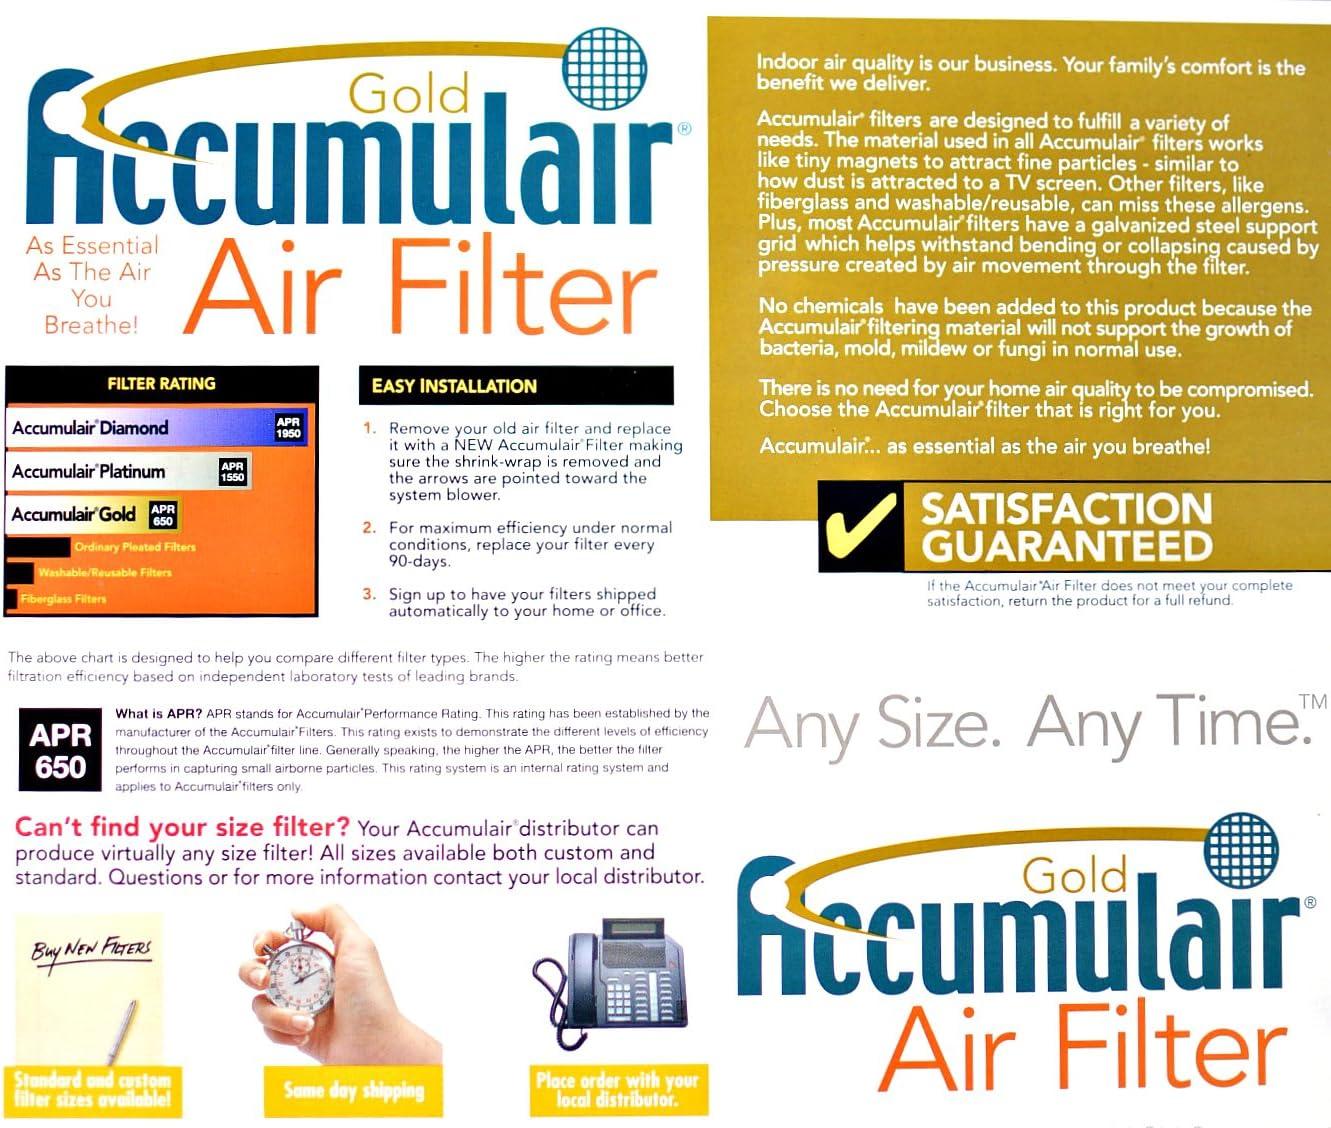 Accumulair Gold 16x24x0.5 15.5x23.5x0.5 4 Pack MERV 8 Air Filter//Furnace Filters